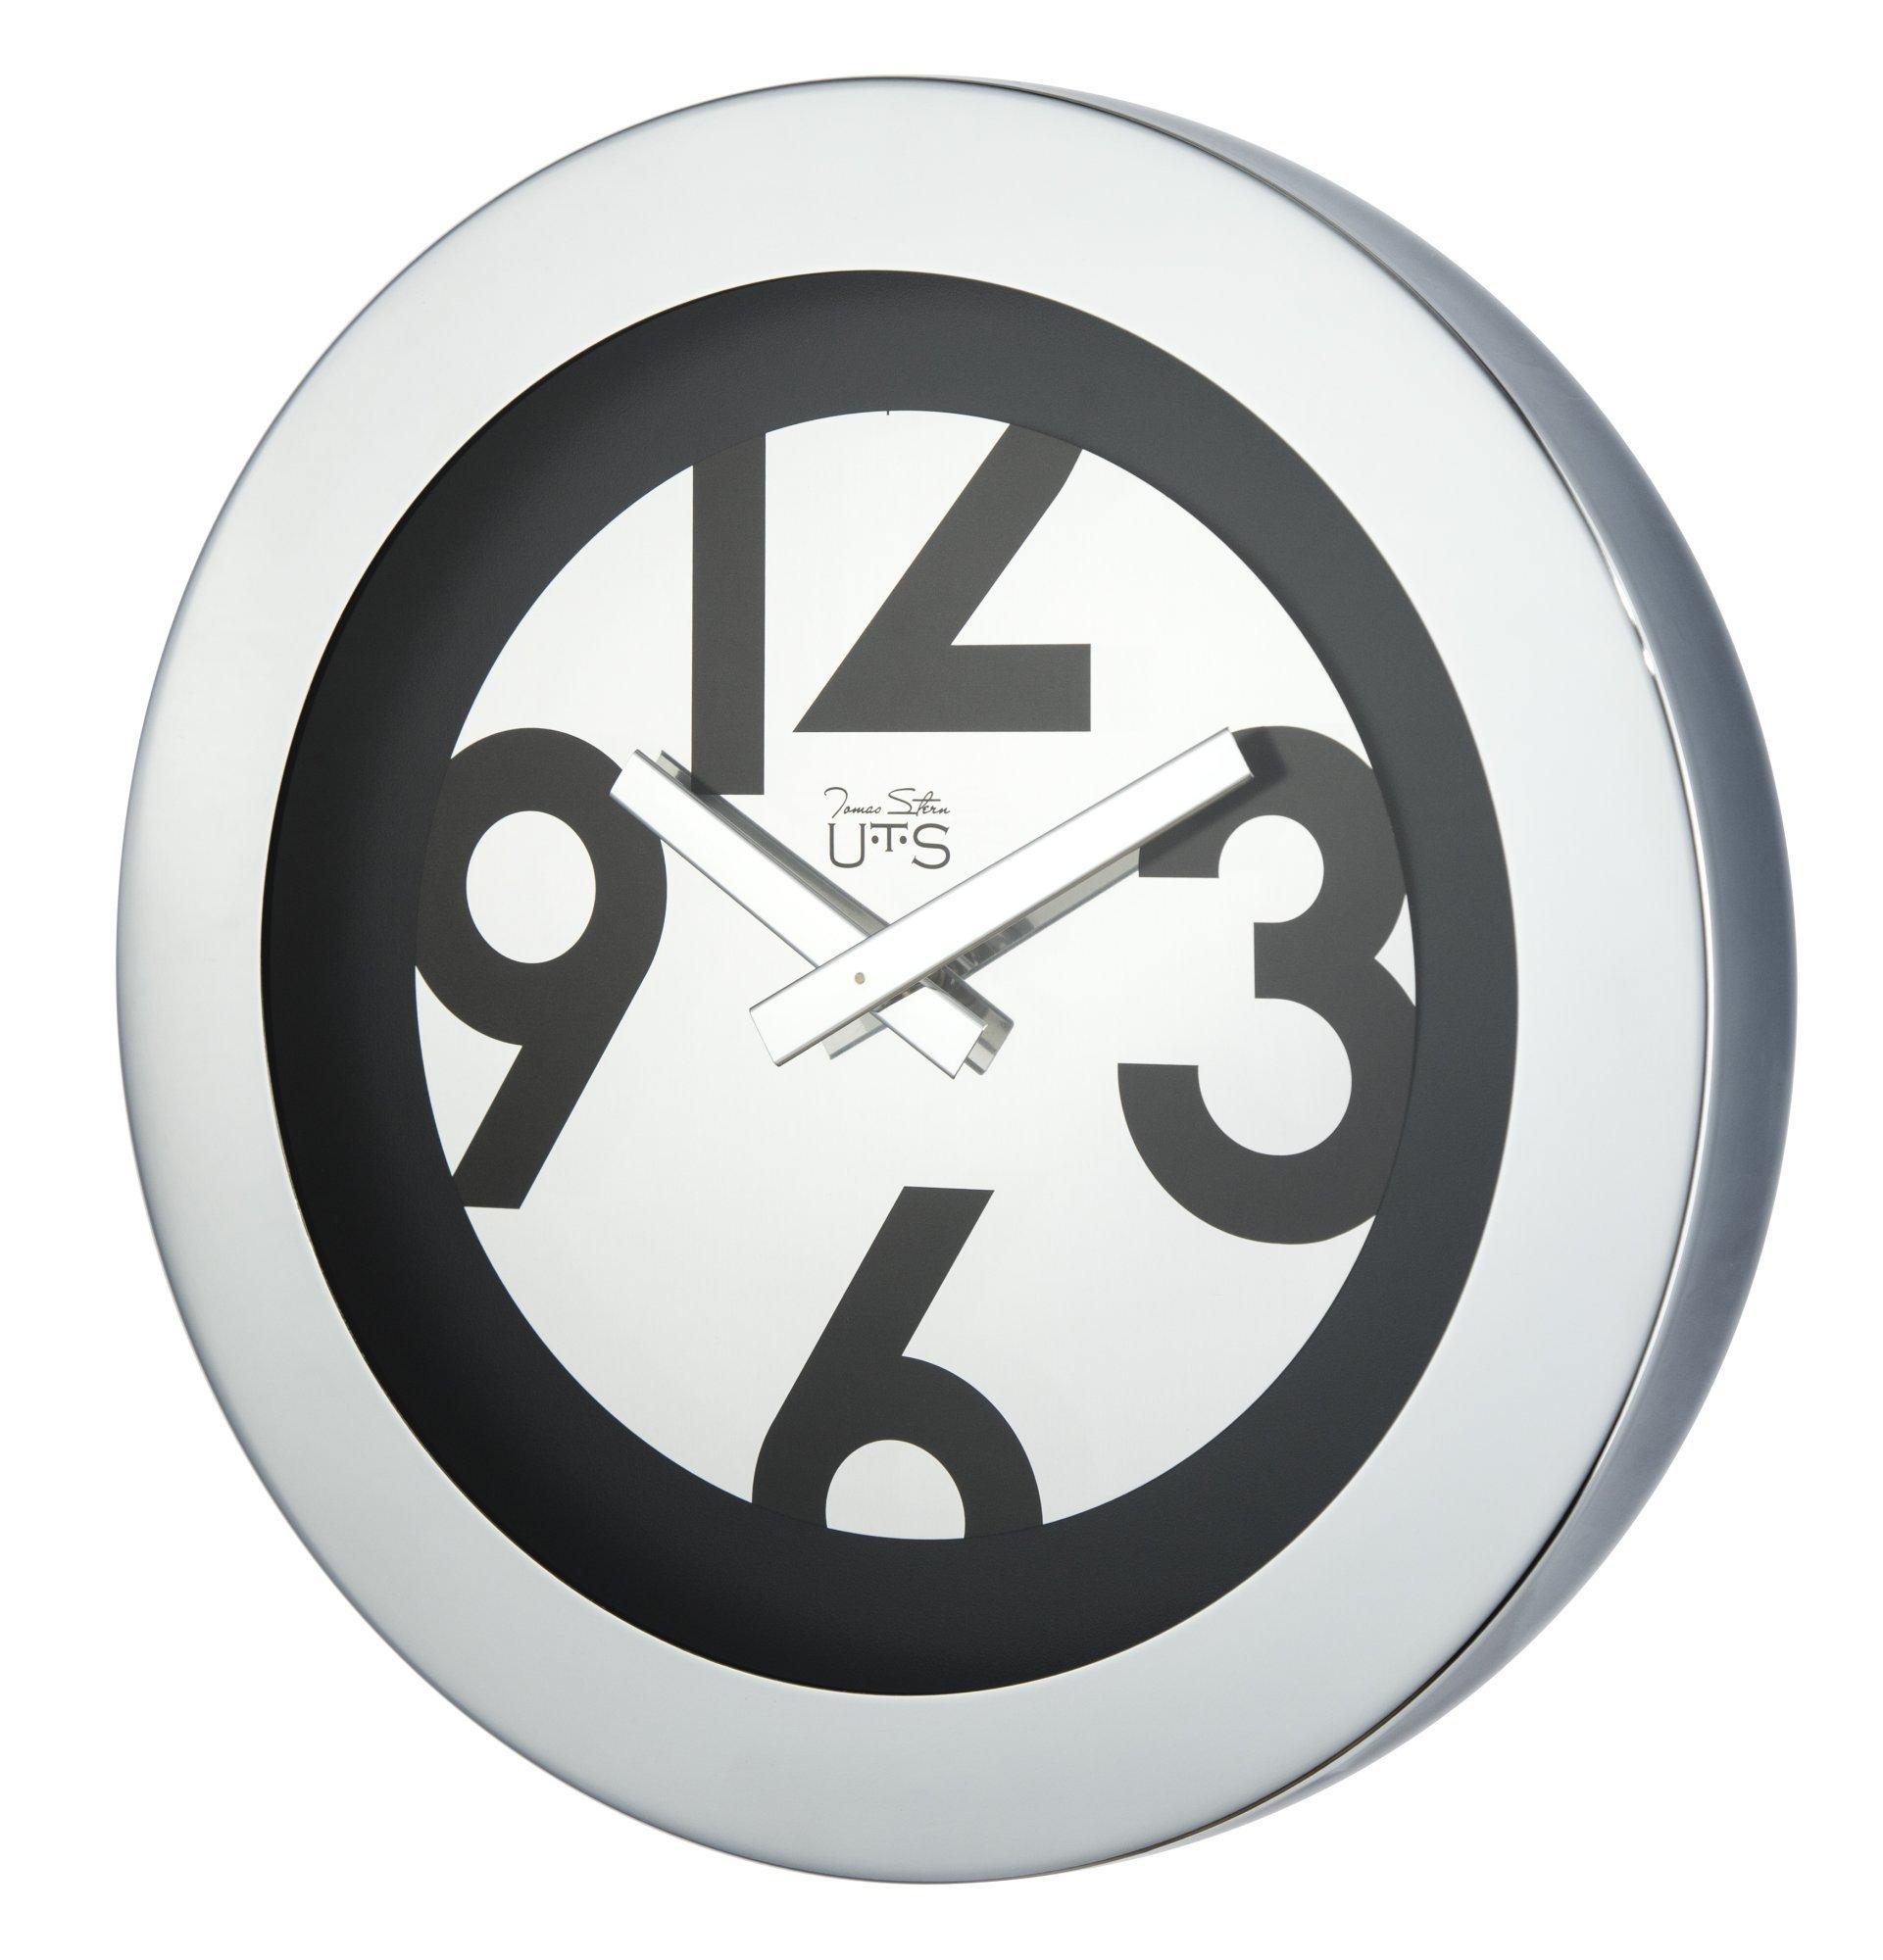 Часы настенные Часы настенные Tomas Stern 4009S chasy-nastennye-tomas-stern-4009s-germaniya.jpg